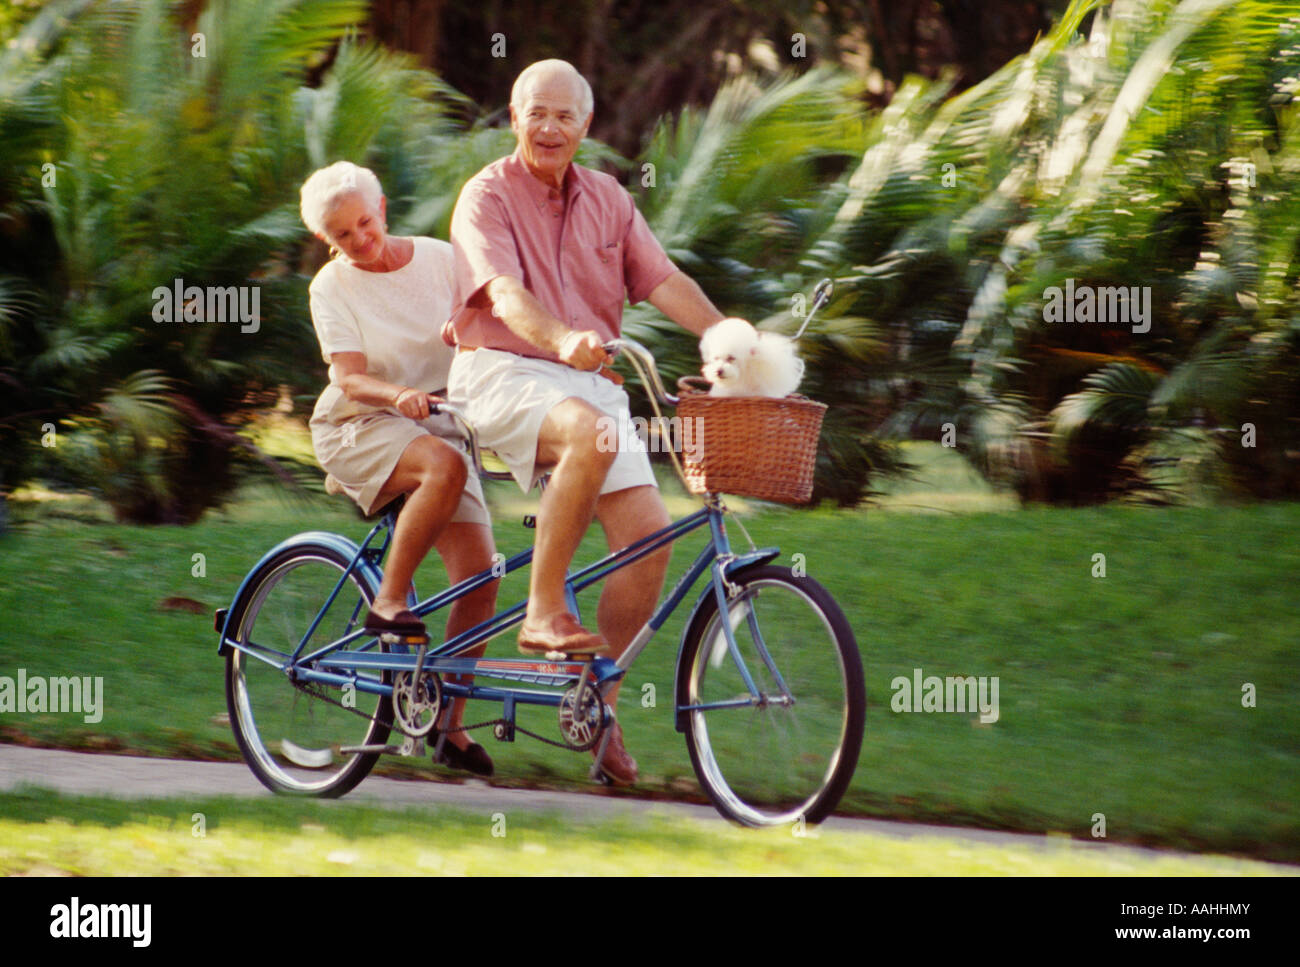 Senior couple riding bicycle - Stock Image